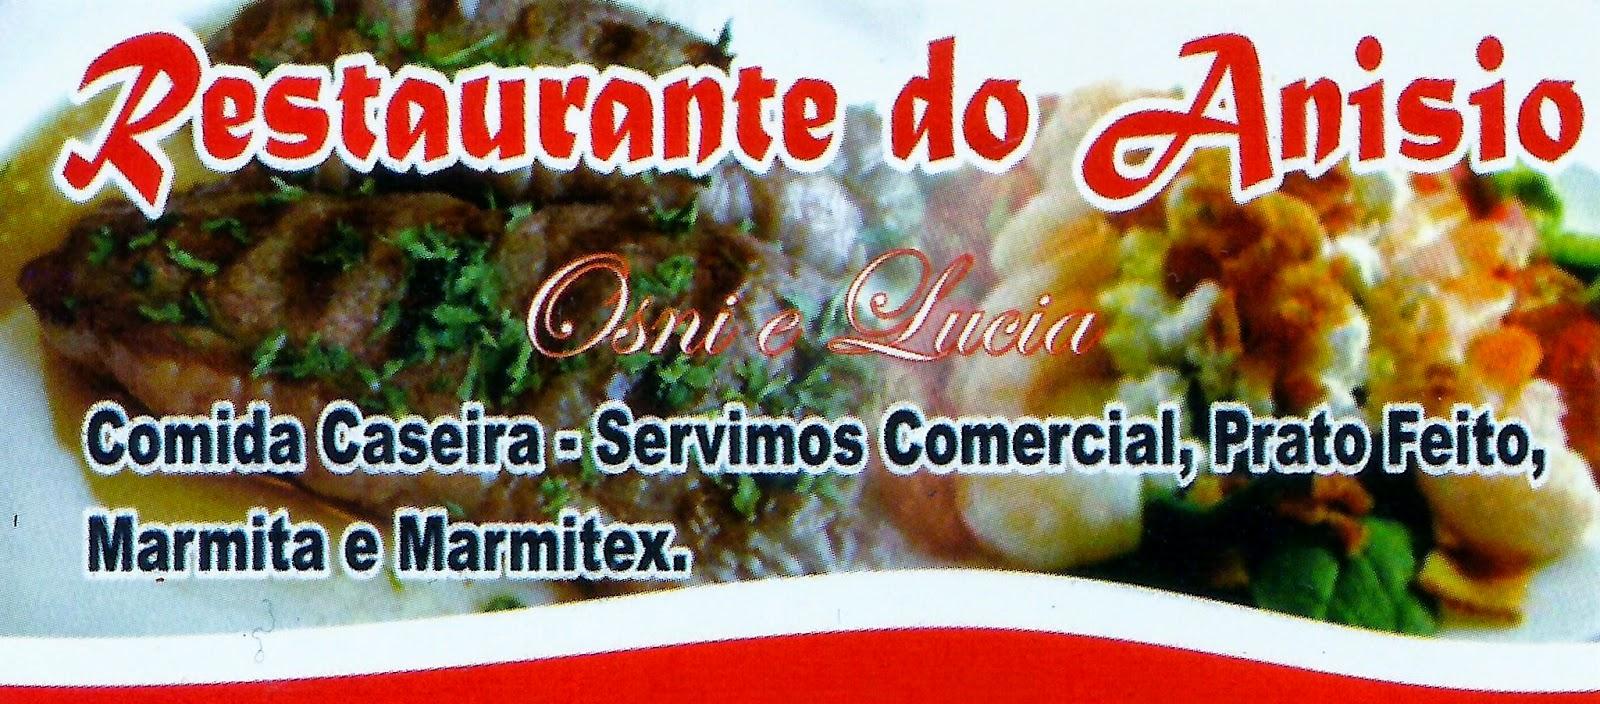 RESTAURANTE  DO ANISIO Rua. José Bonifácio, 186 Centro - Tatuí - SP tel: (15) 3305-4237 / 3259-7809